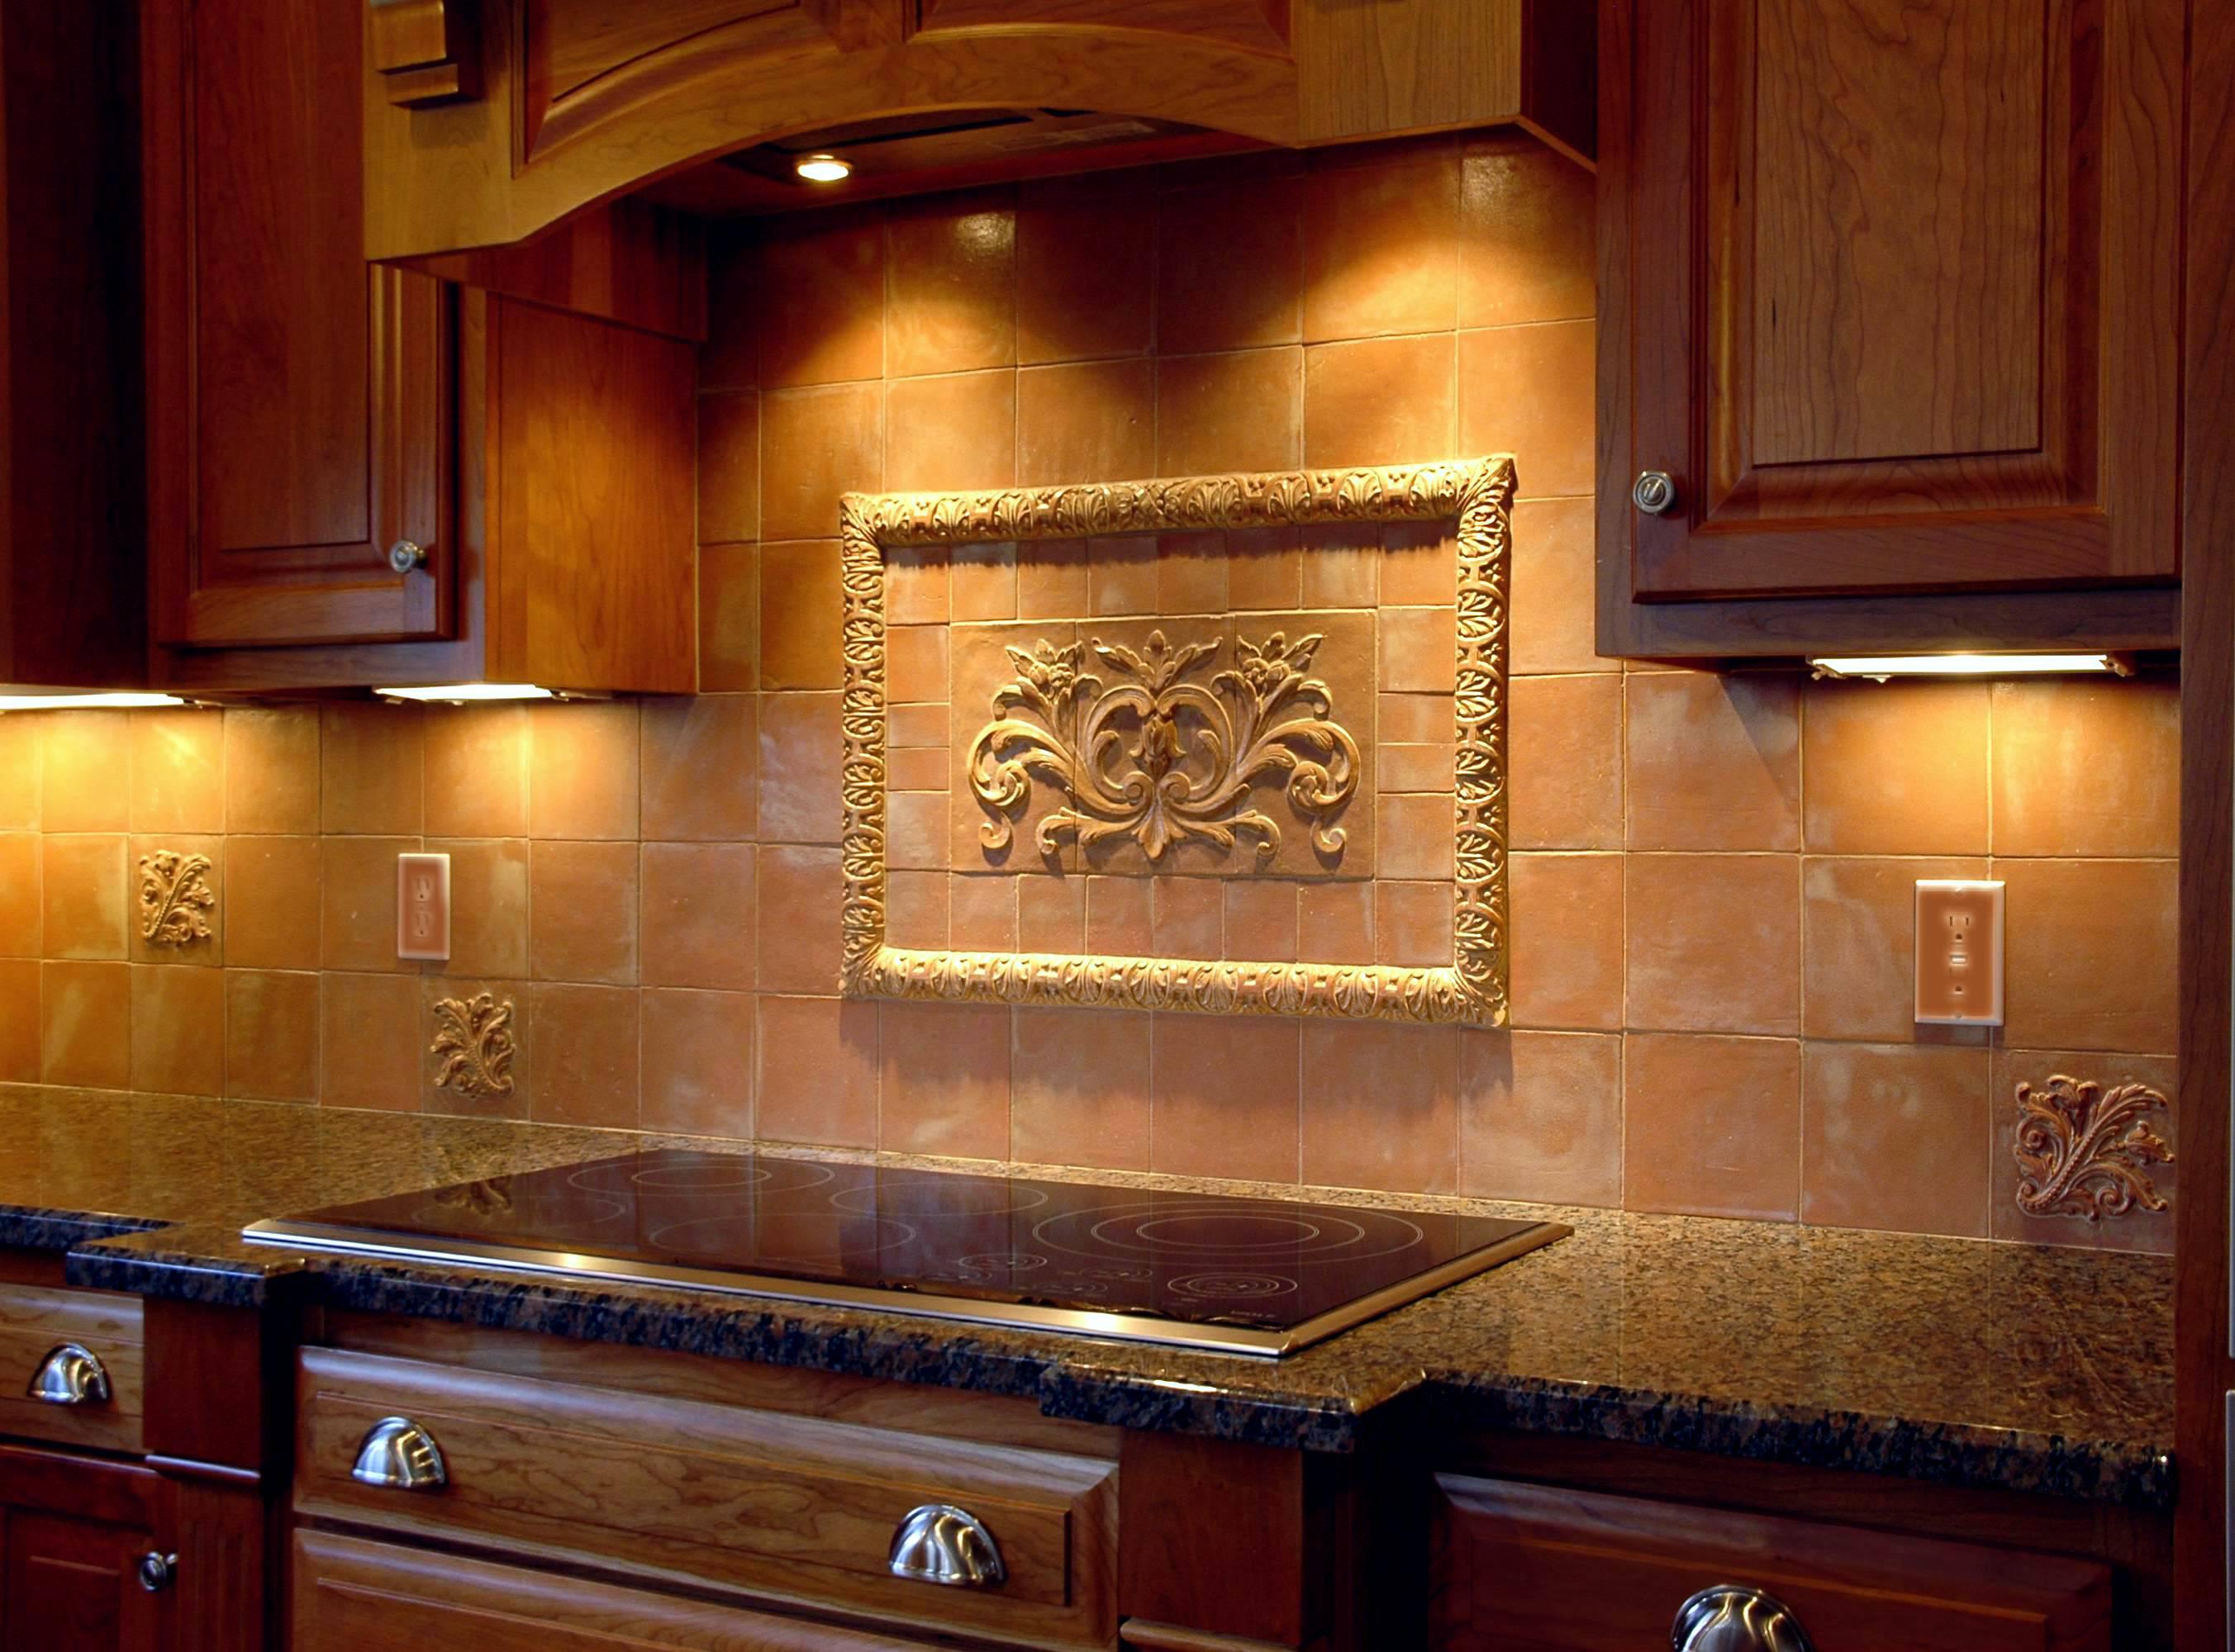 Glass For Kitchen Cabinets Inserts Hand Pressed Floral Tiles Installed In Kitchen Backsplash